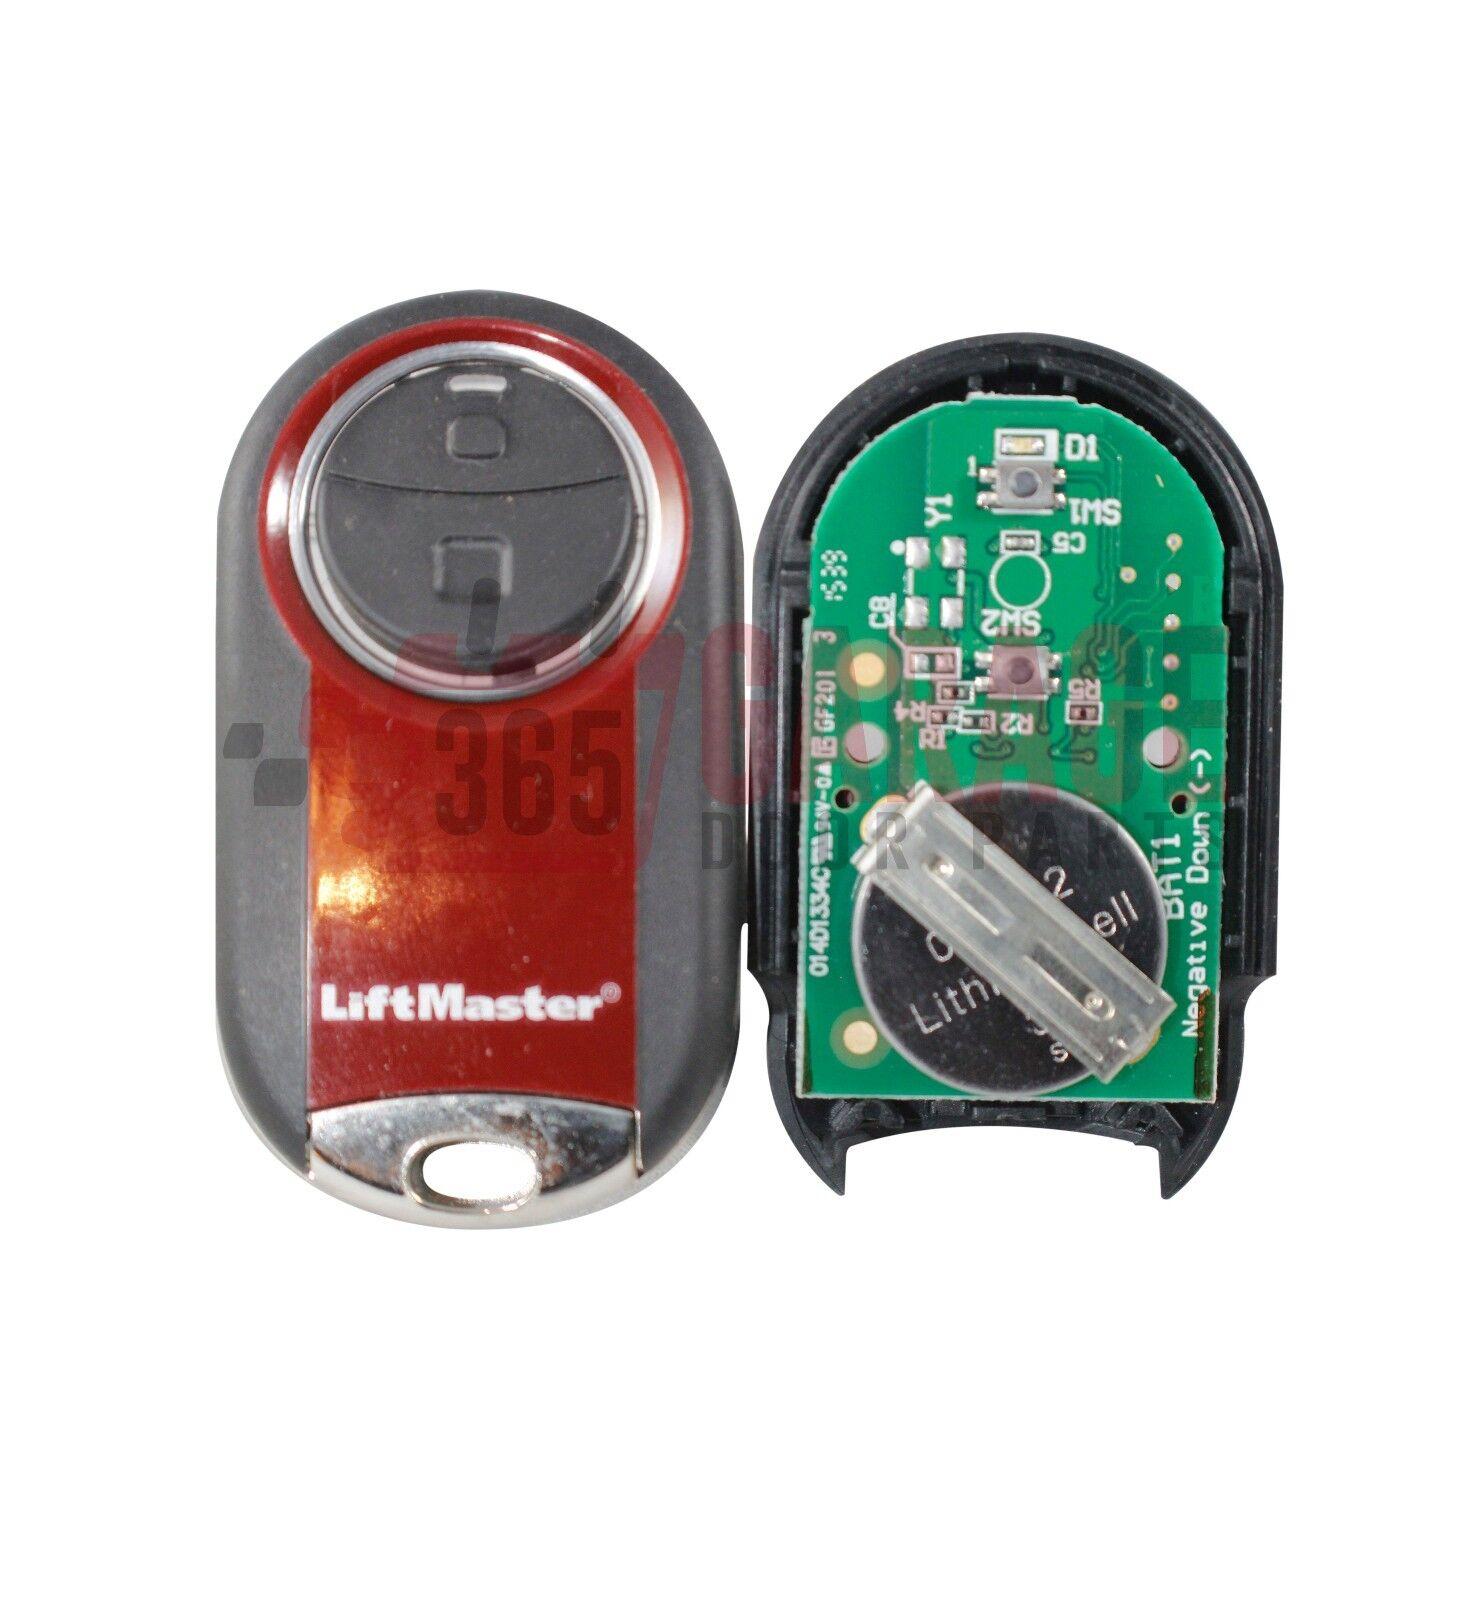 Liftmaster Garage Door Opener Light Keeps Coming On: Liftmaster 374UT Mini Universal Remote Control